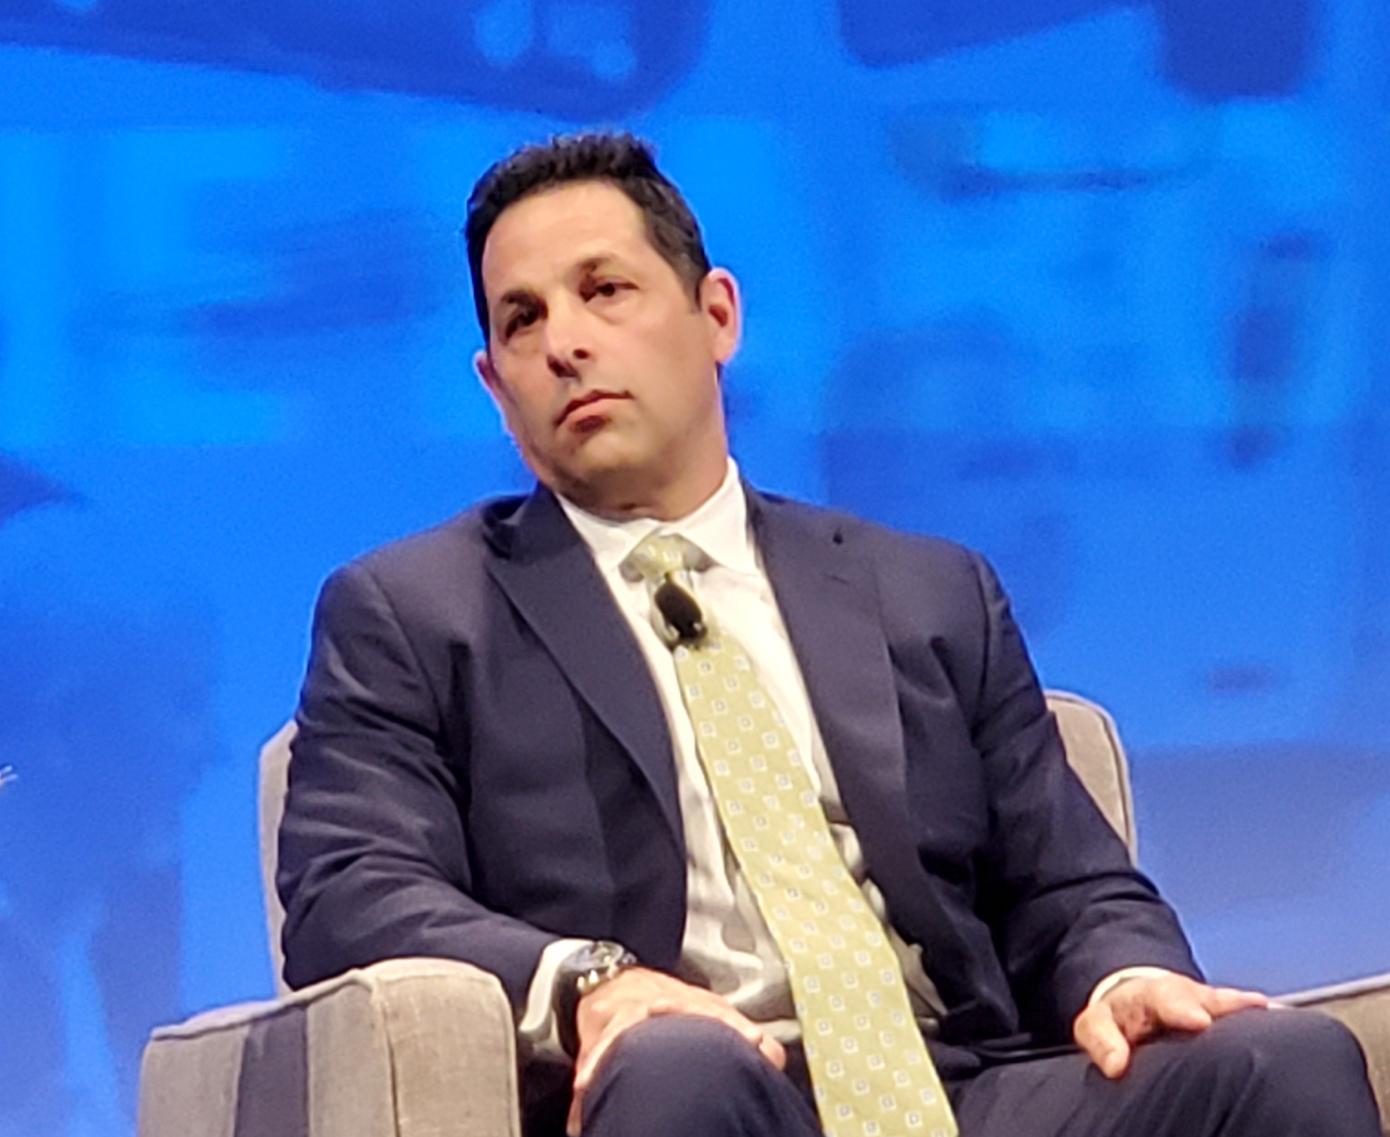 Paul Rosa, senior vice president of procurement and fleet planning for Penske Truck Leasing